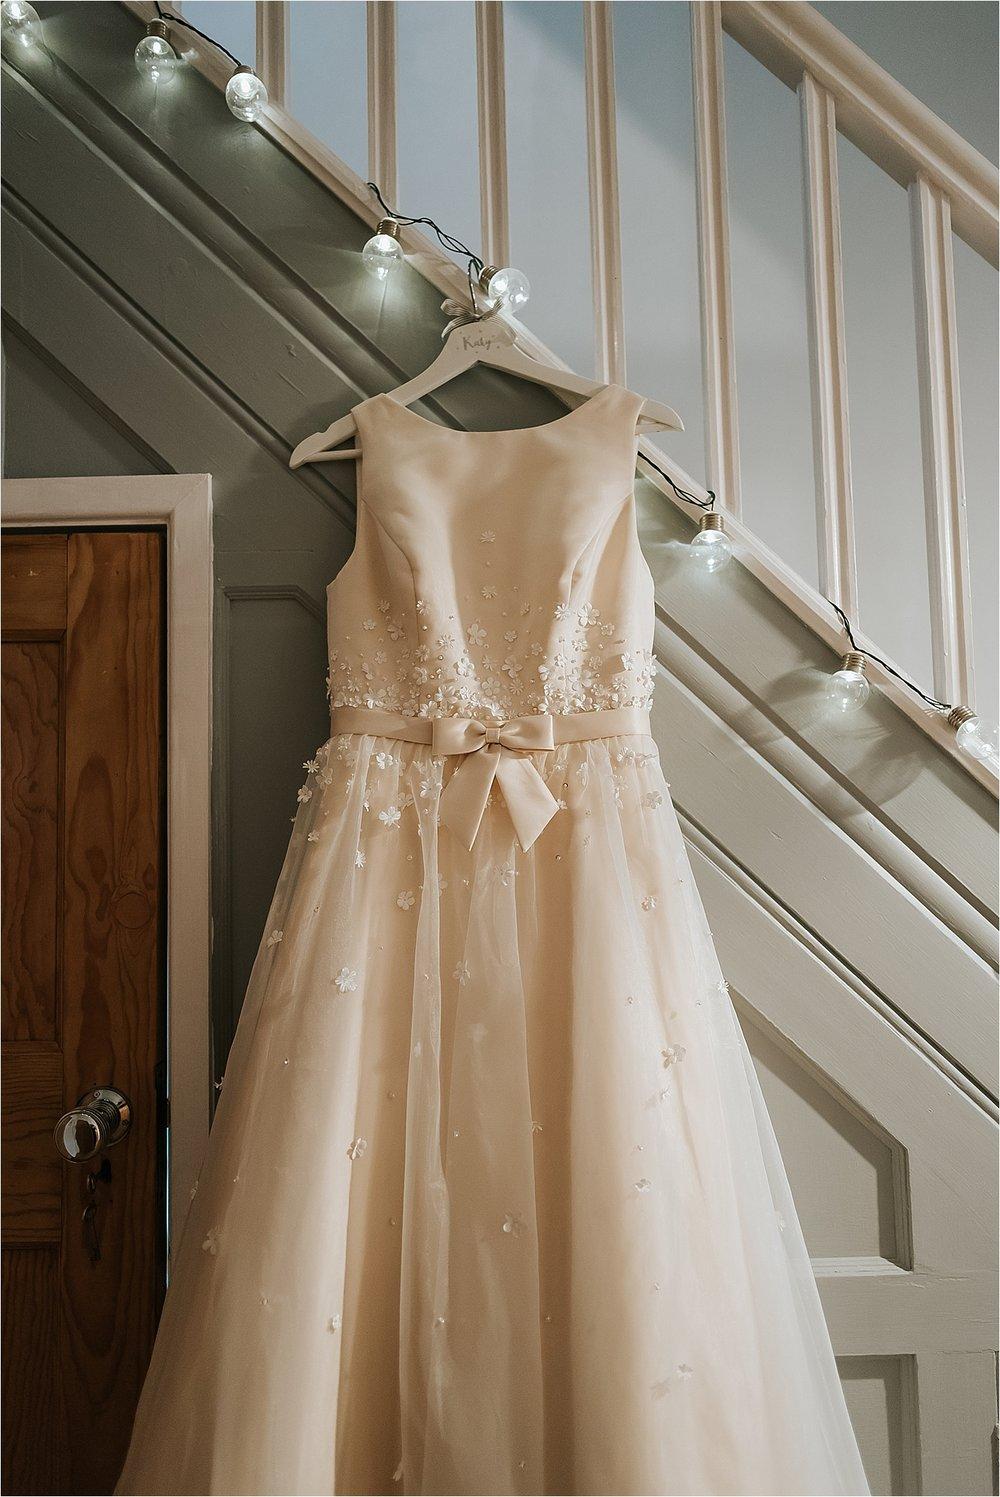 wedding dress by charlotte balbier